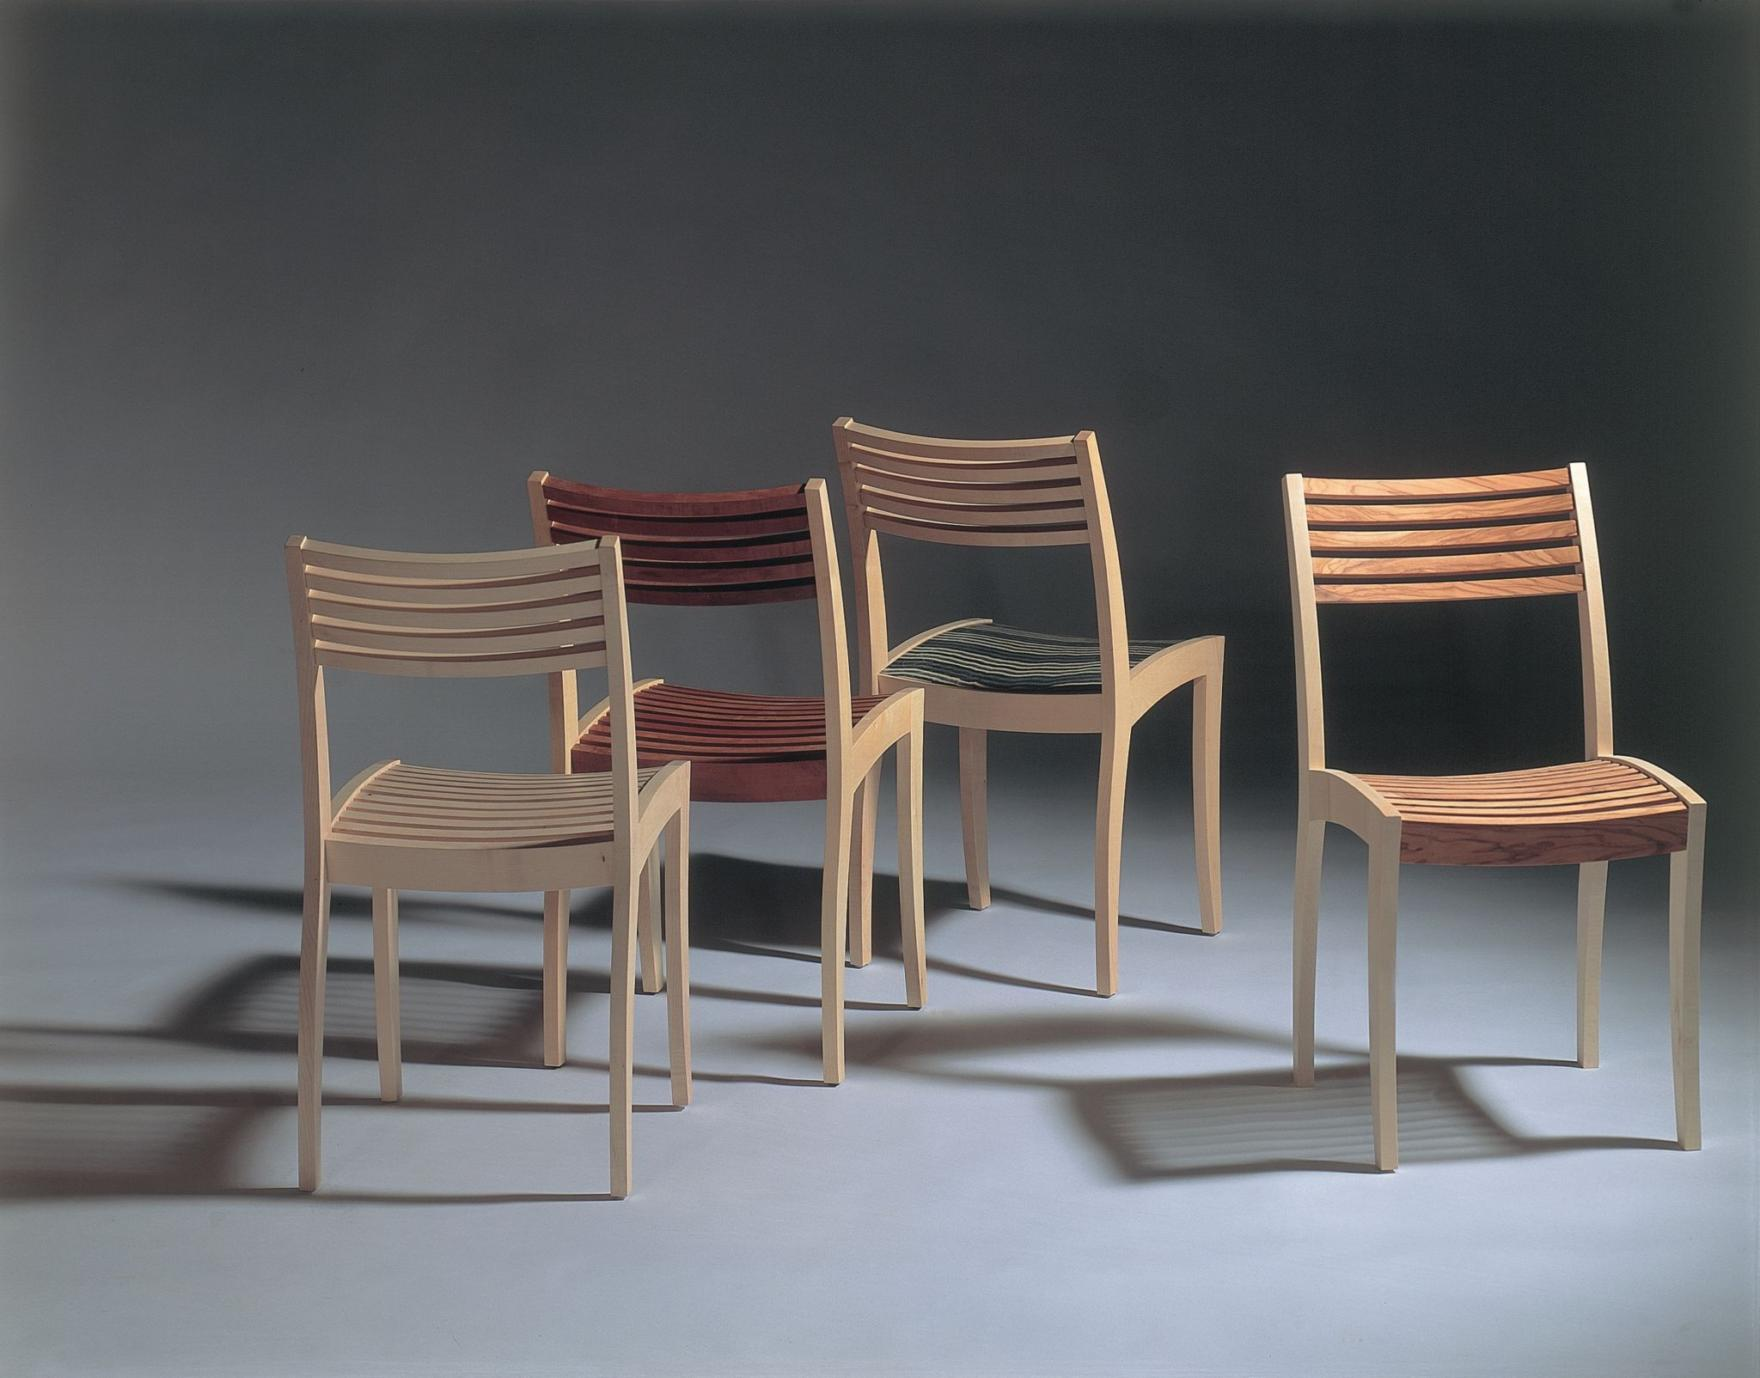 stuhl-gazelle-1994